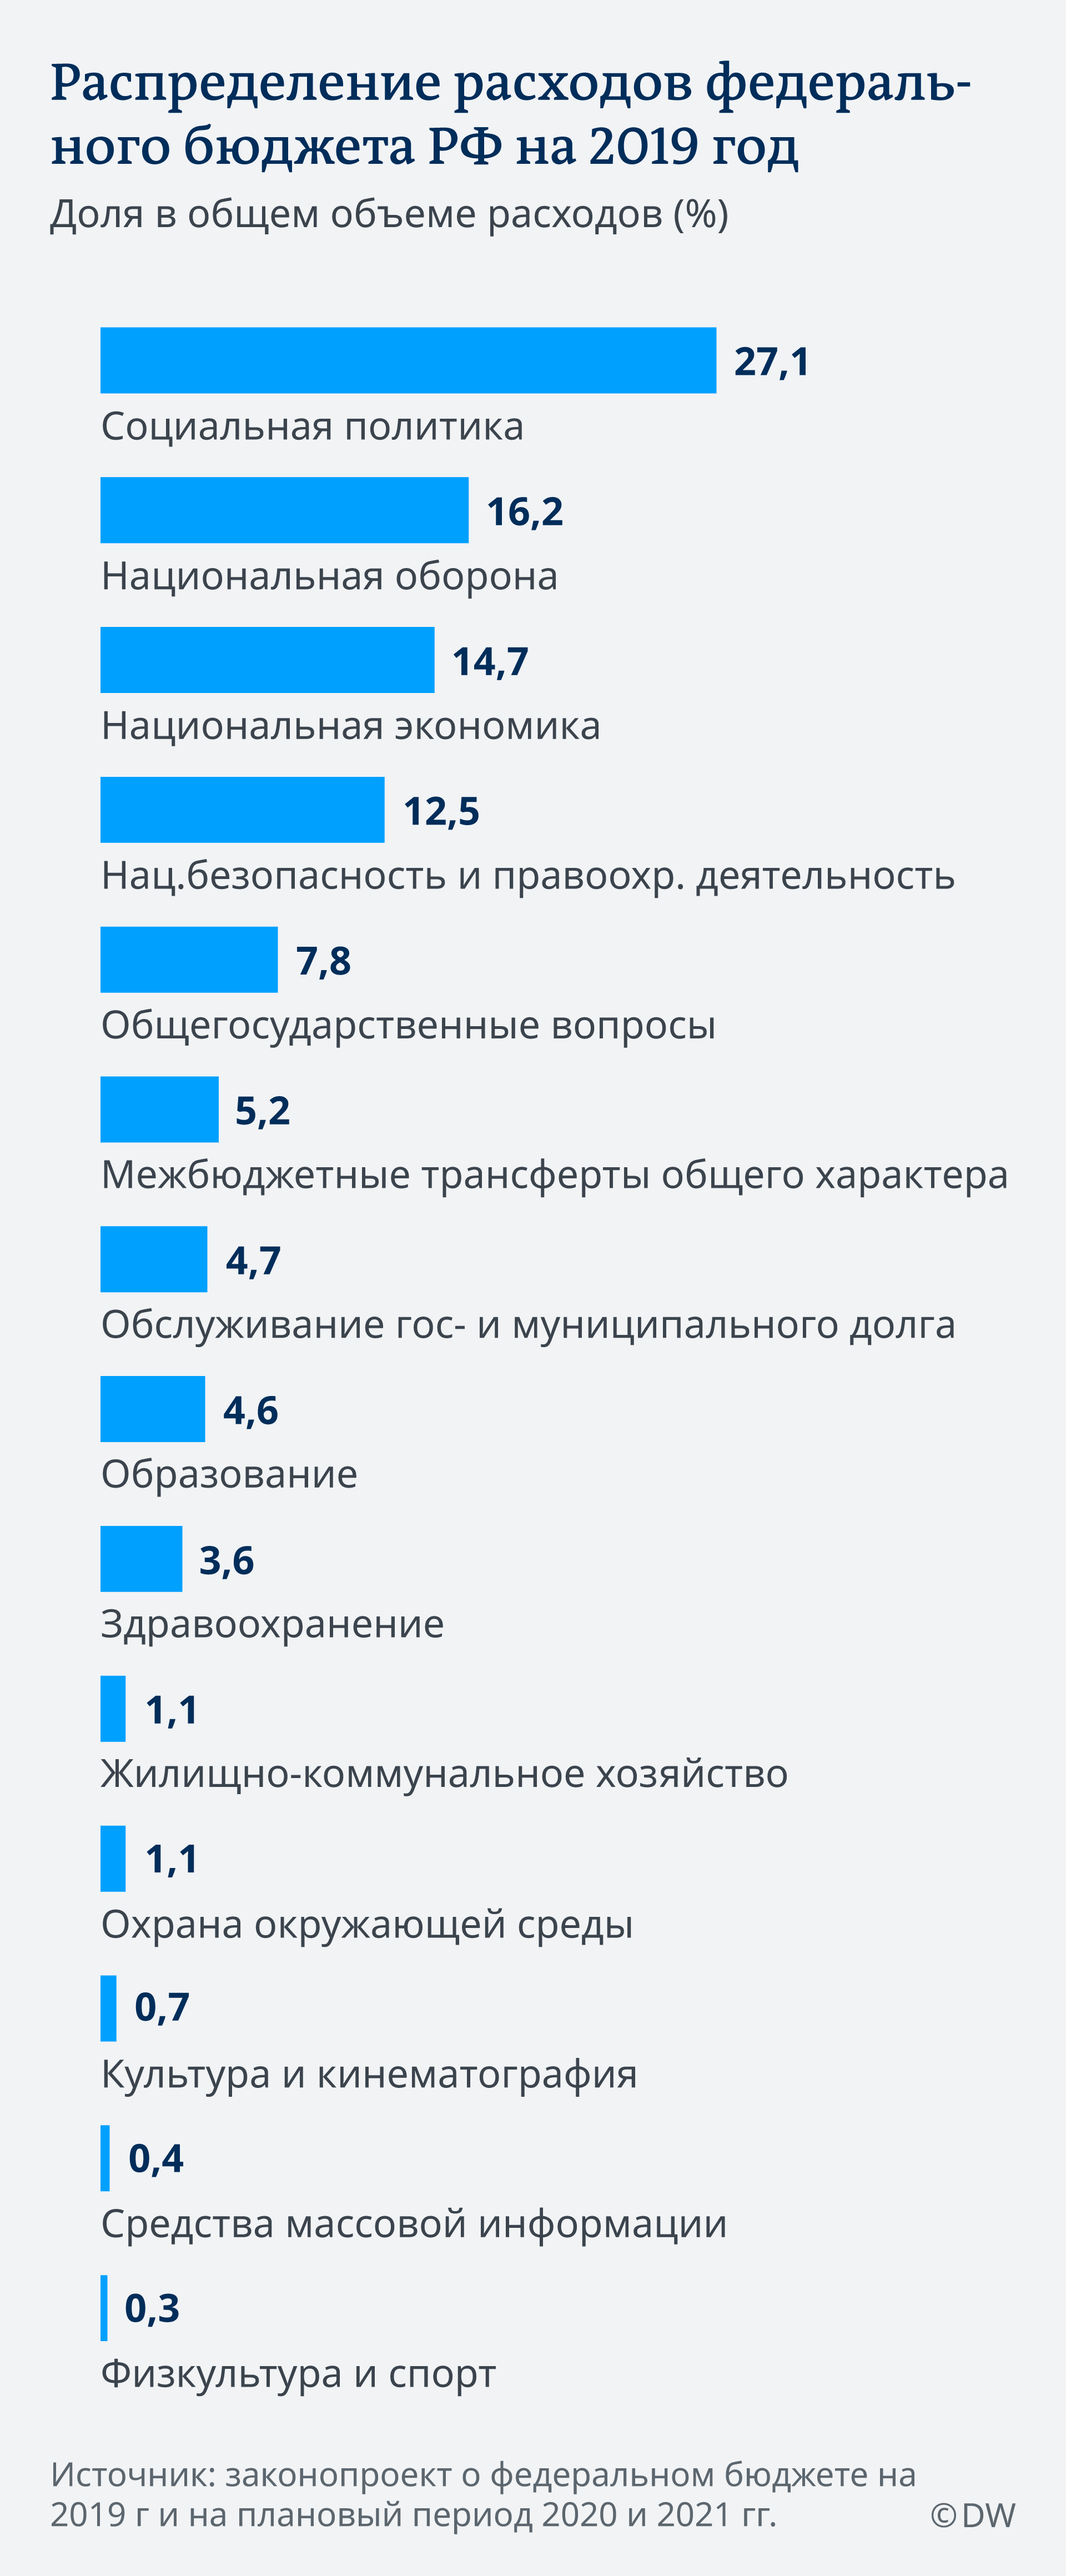 Infografik Ausgaben im Bundeshaushalt Russlands 2019 RU